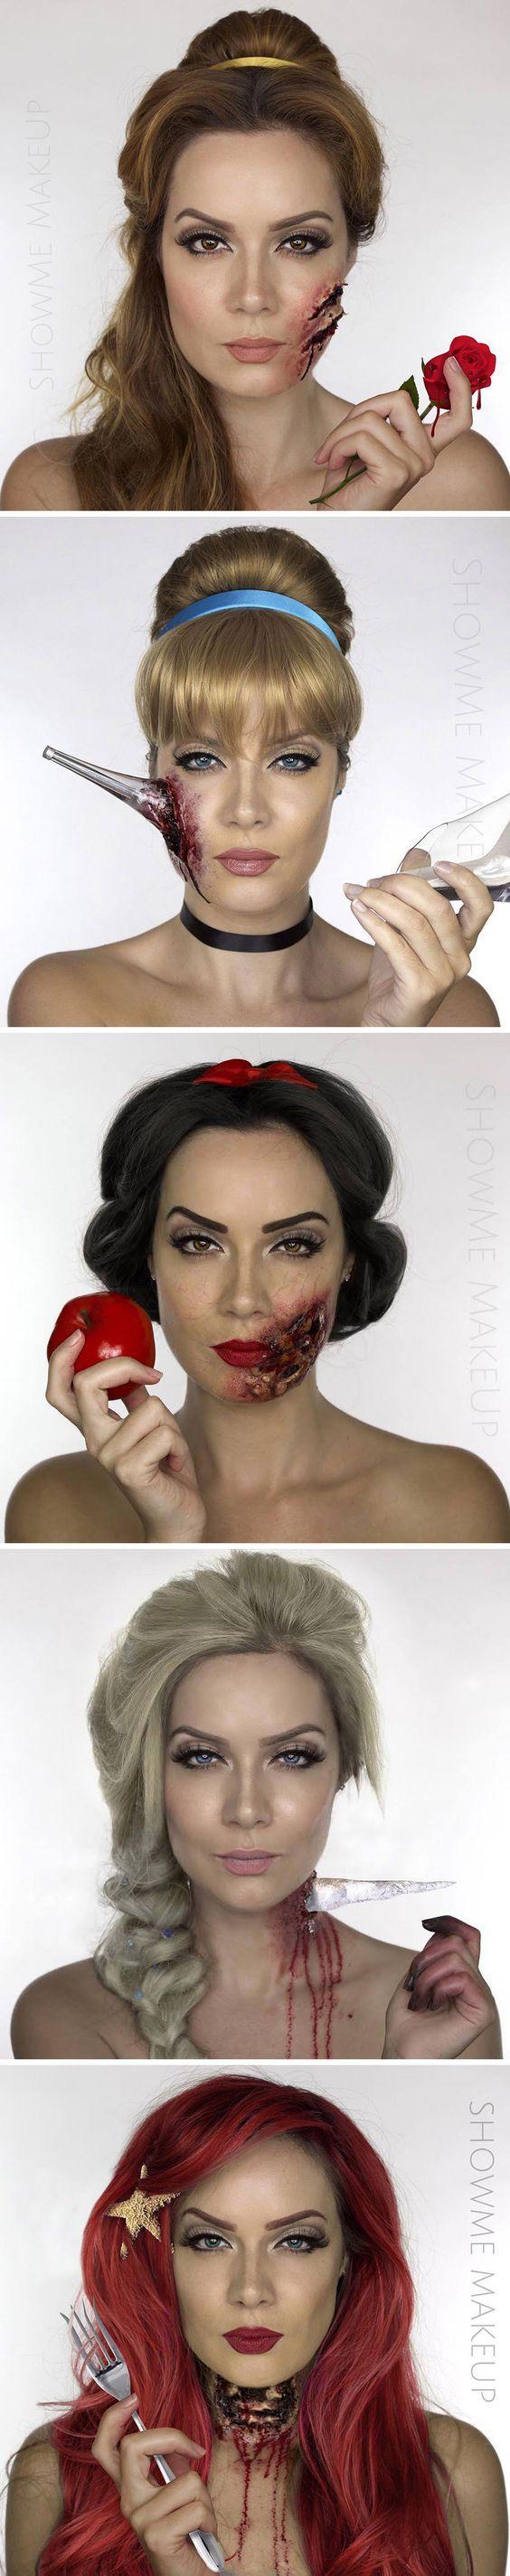 Twisted disney princesses halloween makeup by shonagh scott